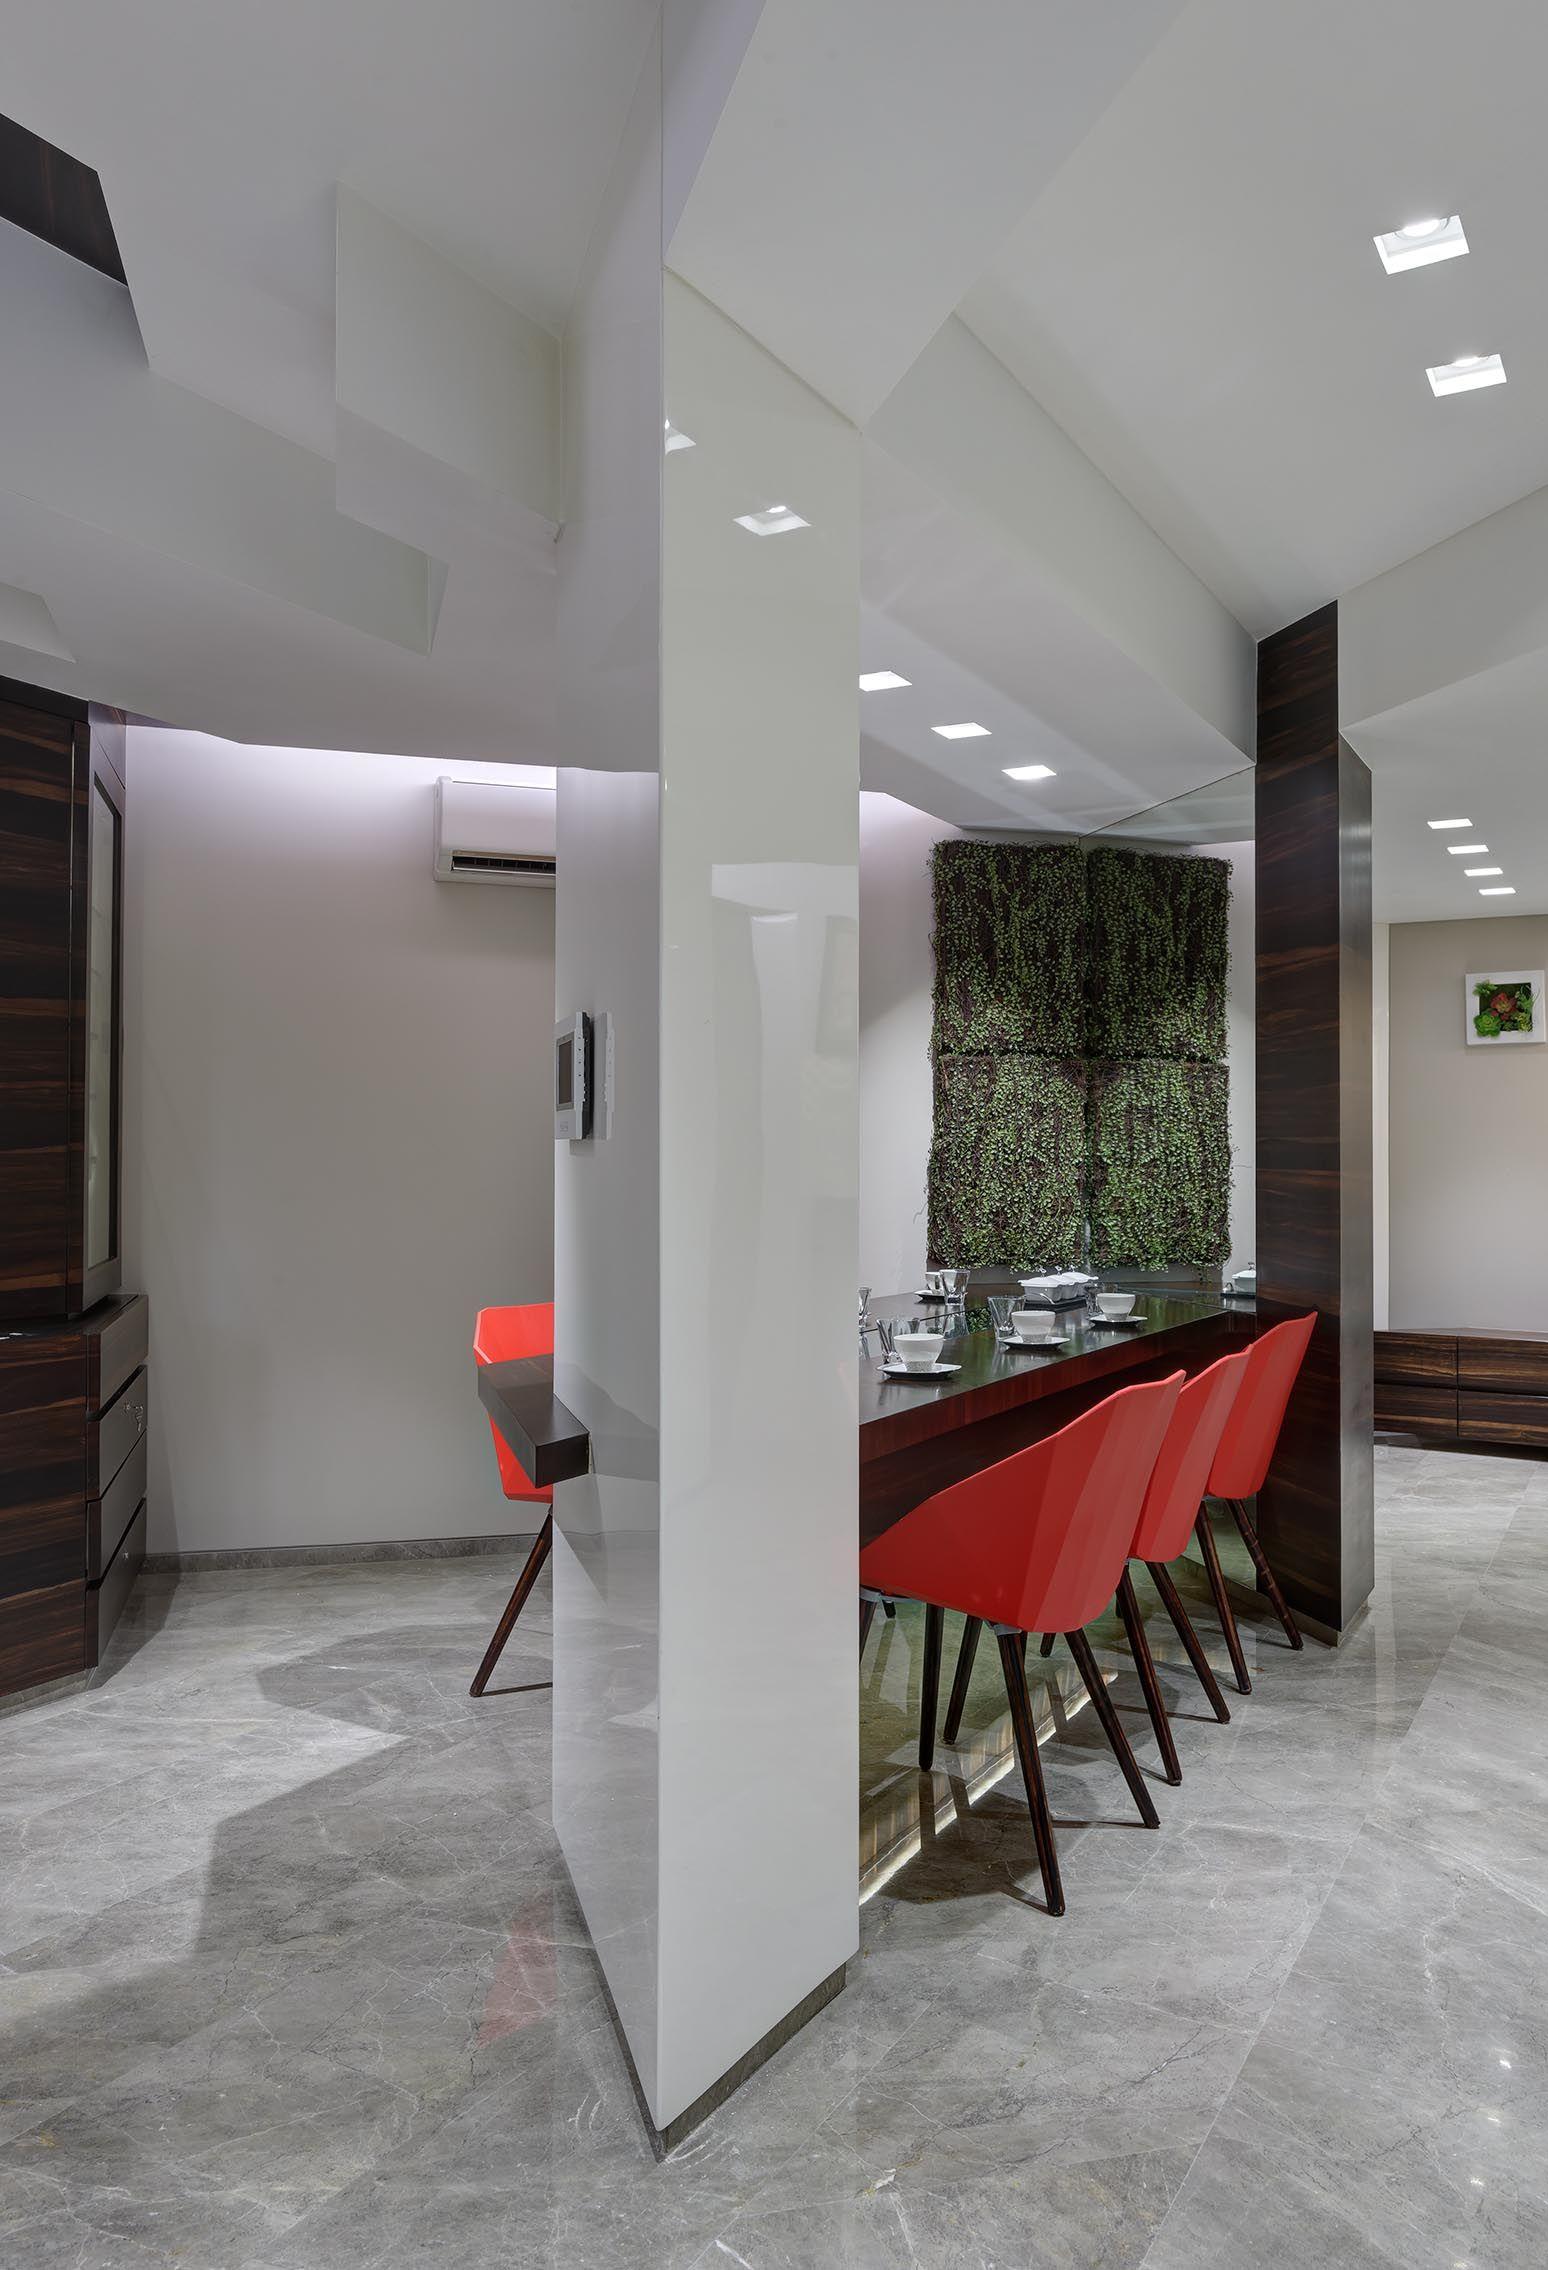 Home interior angles angle house angular designed  dining room  interior design